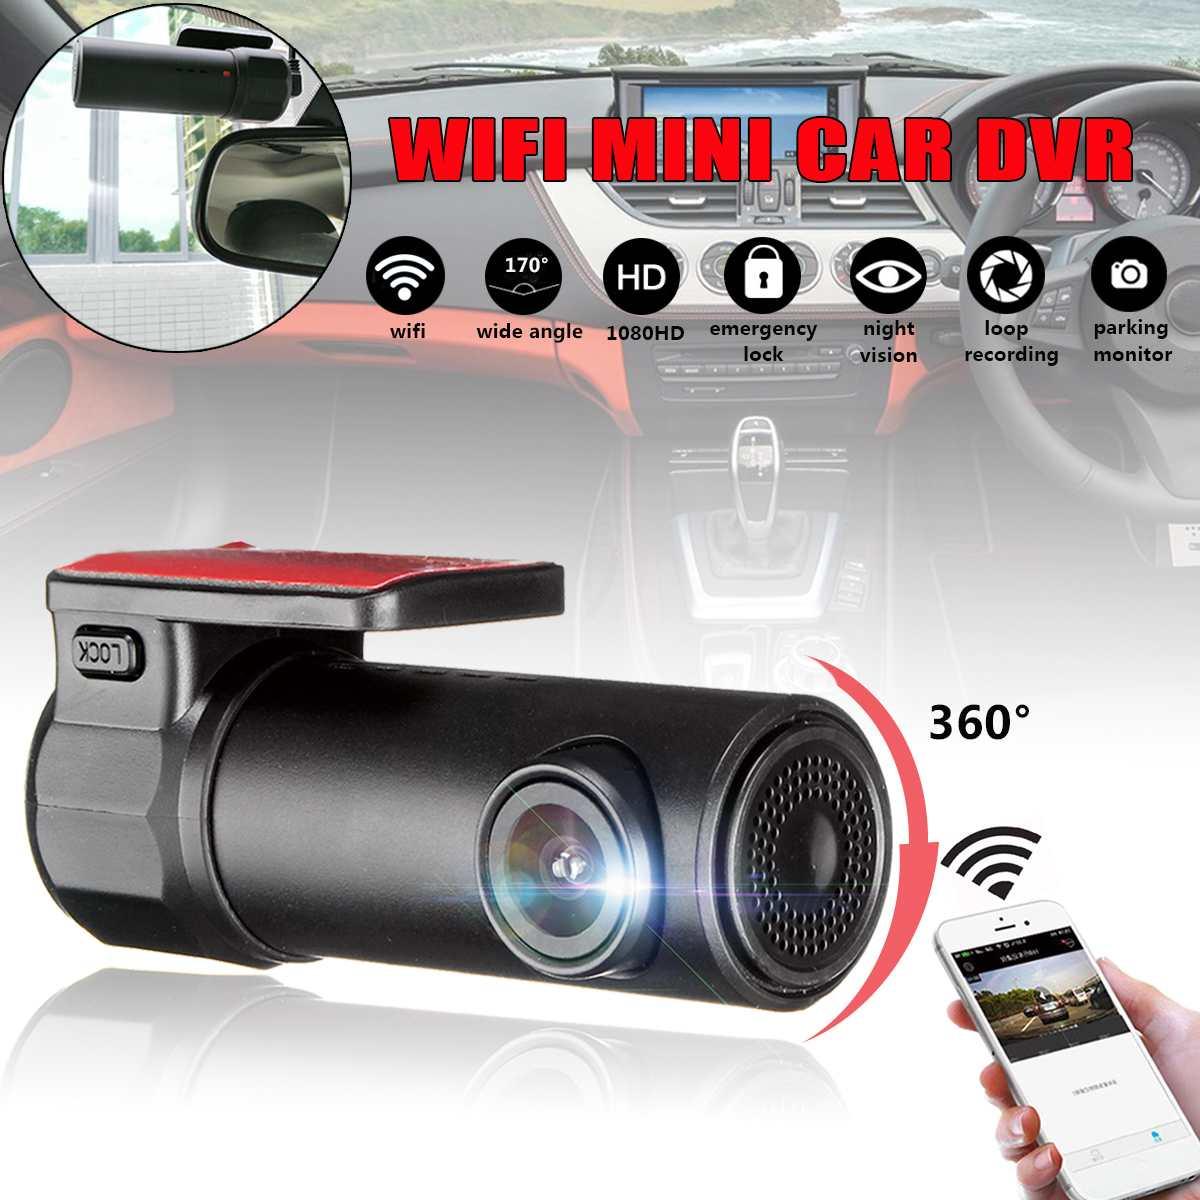 1080P HD واي فاي جهاز تسجيل فيديو رقمي للسيارات داش كاميرا كاميرا صغيرة مسجل فيديو سيارة لاسلكية داش داشكام السيارات ليلة الإصدار 170 درجة